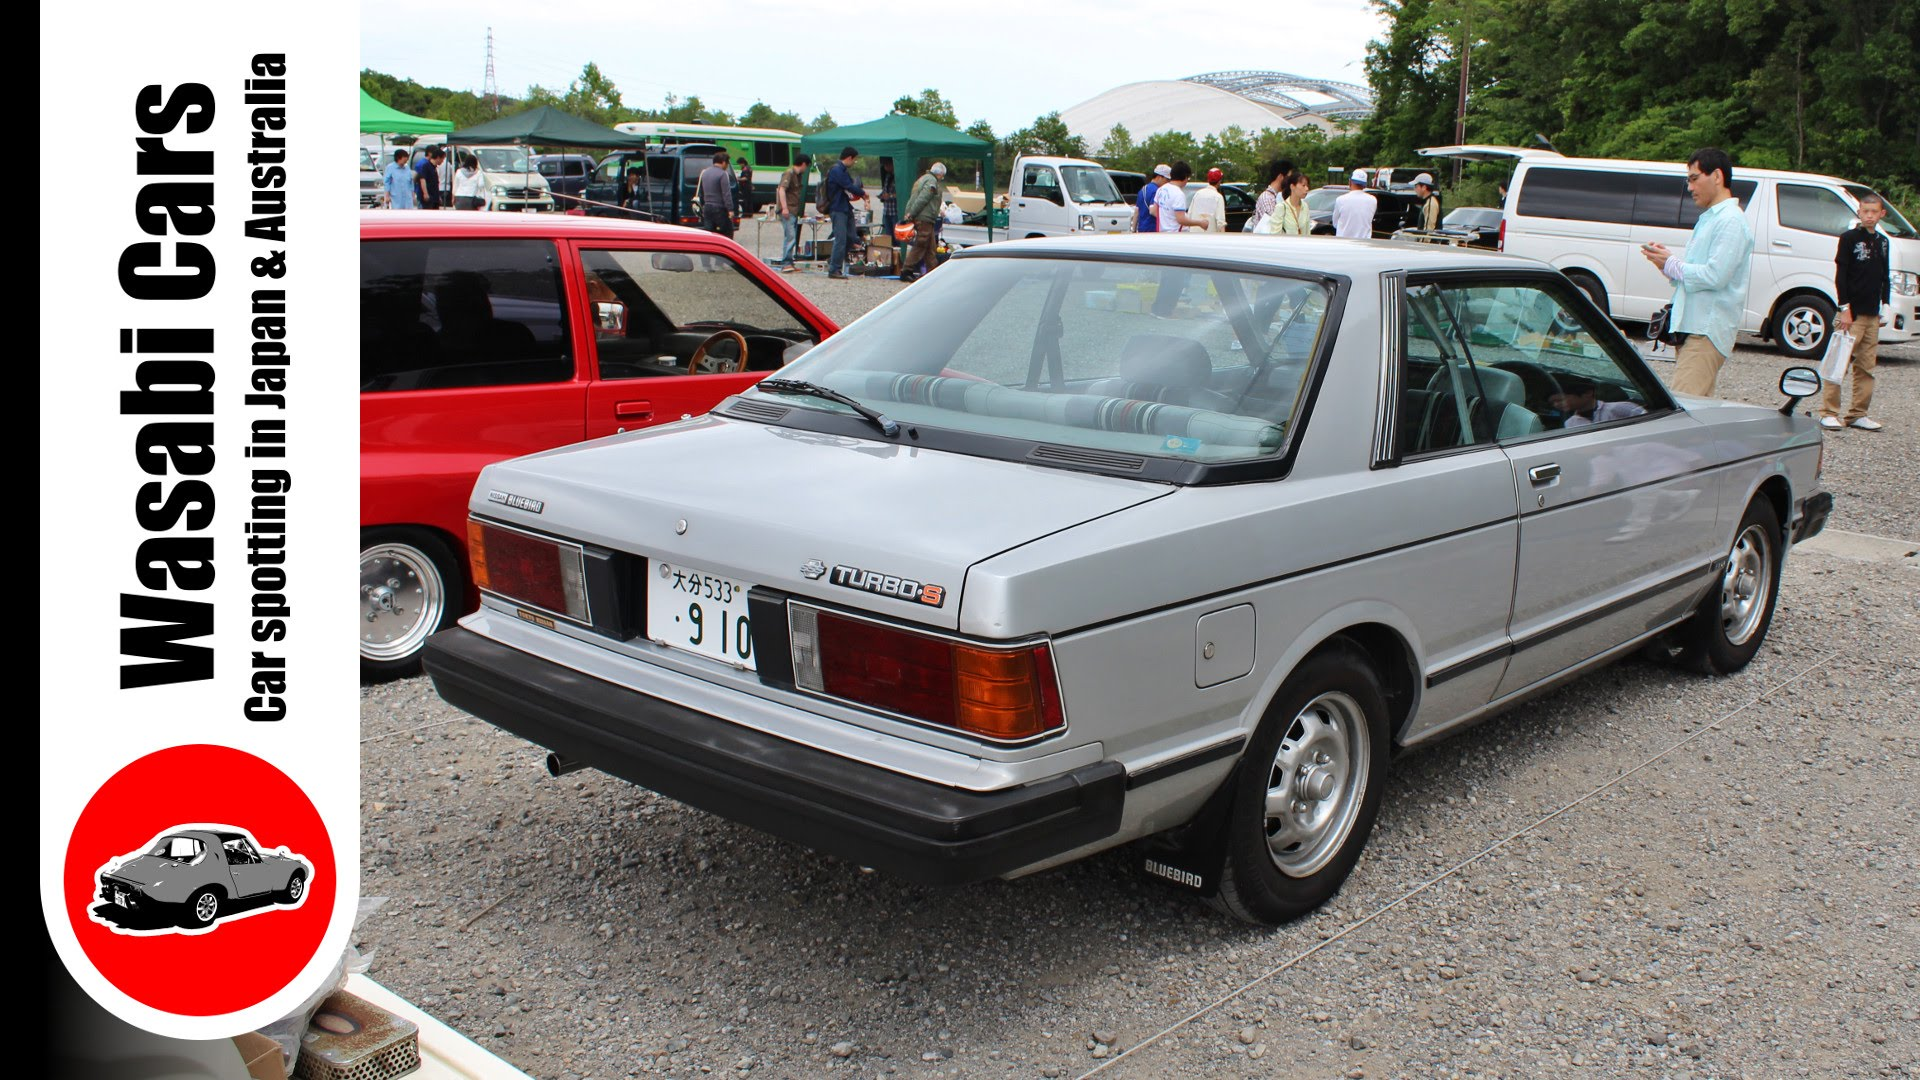 Nissan Bluebird VI (910) 1979 - 1983 Coupe #2